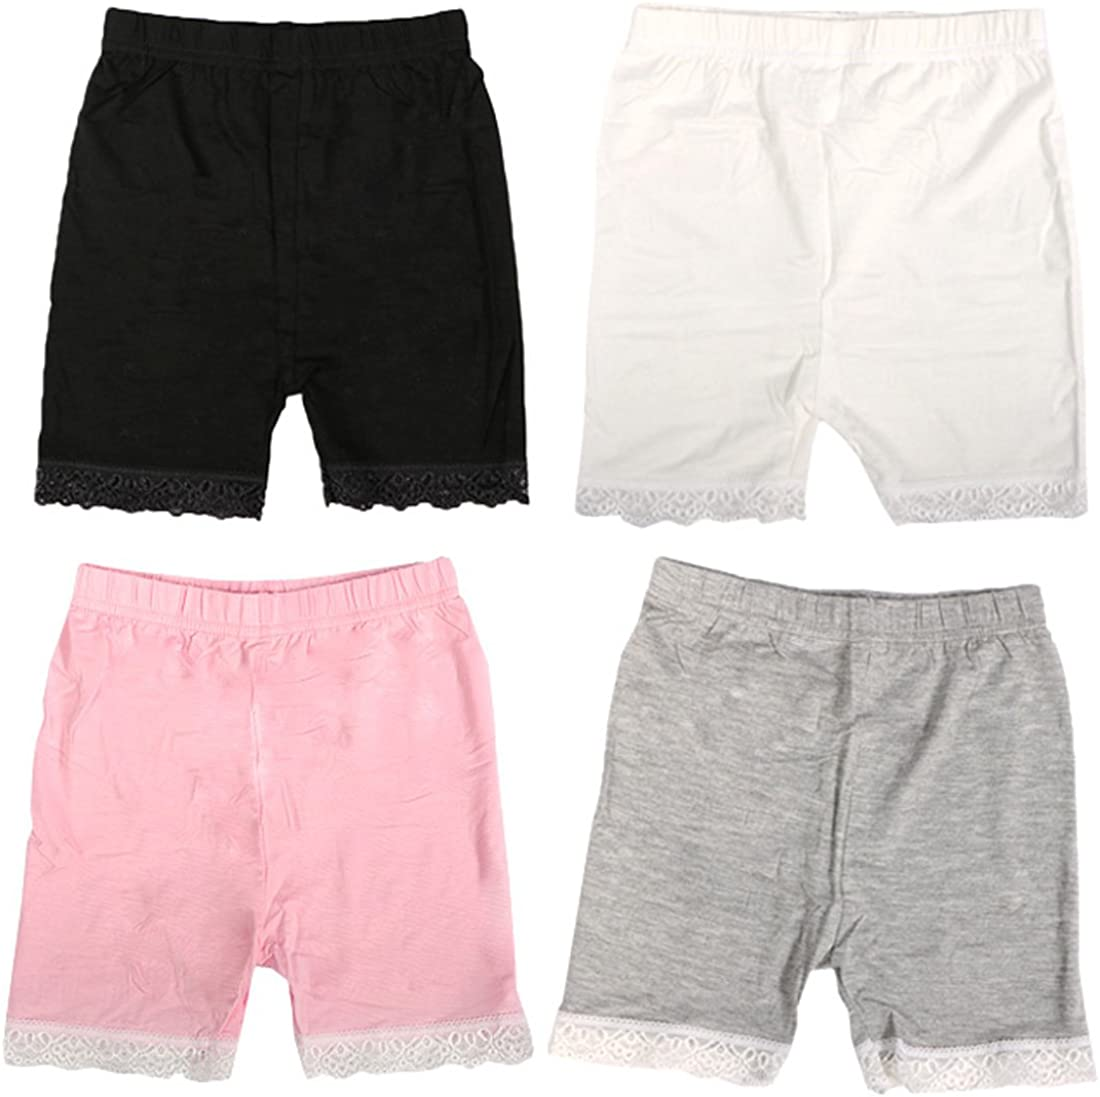 Set of 4 MyKazoe Girls Bike Shorts with Lace Trim